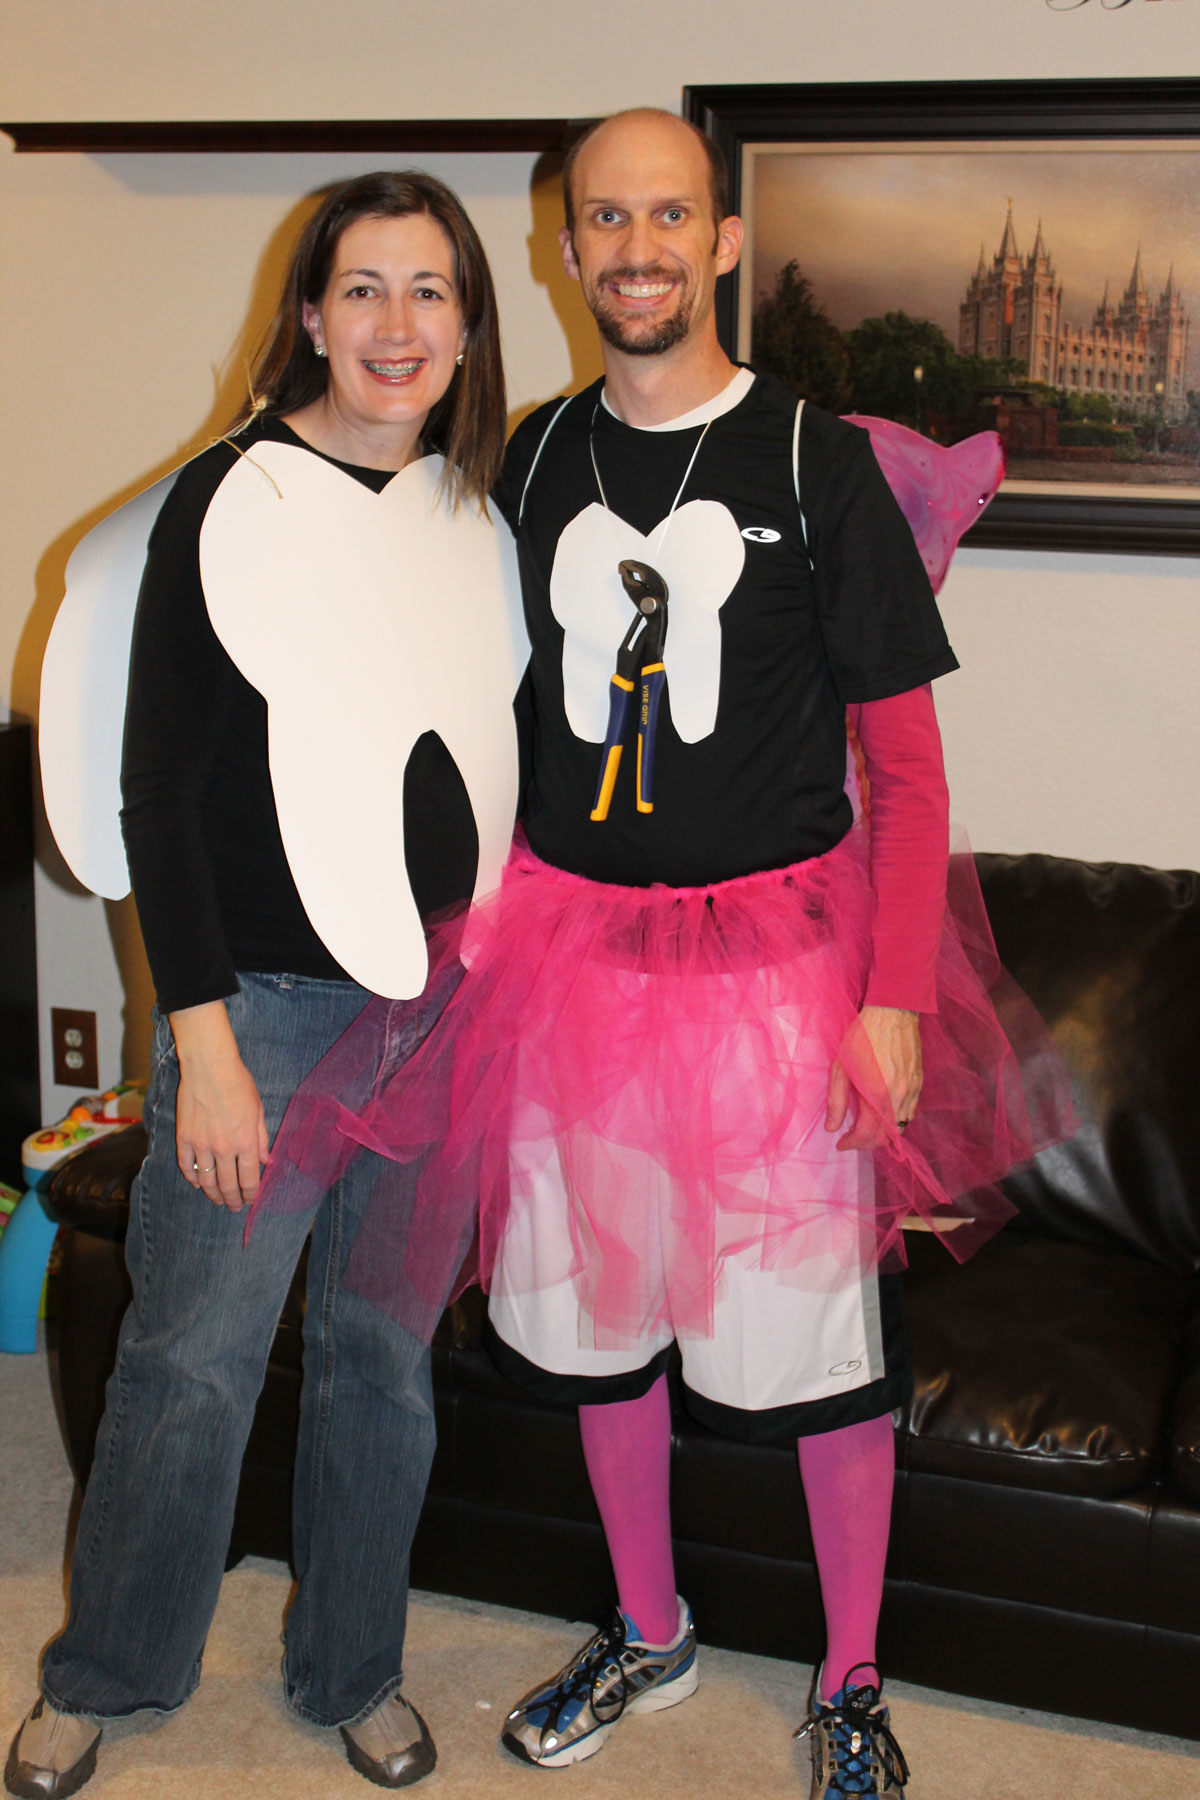 Dr-W-&-wife-Halloween2.jpg